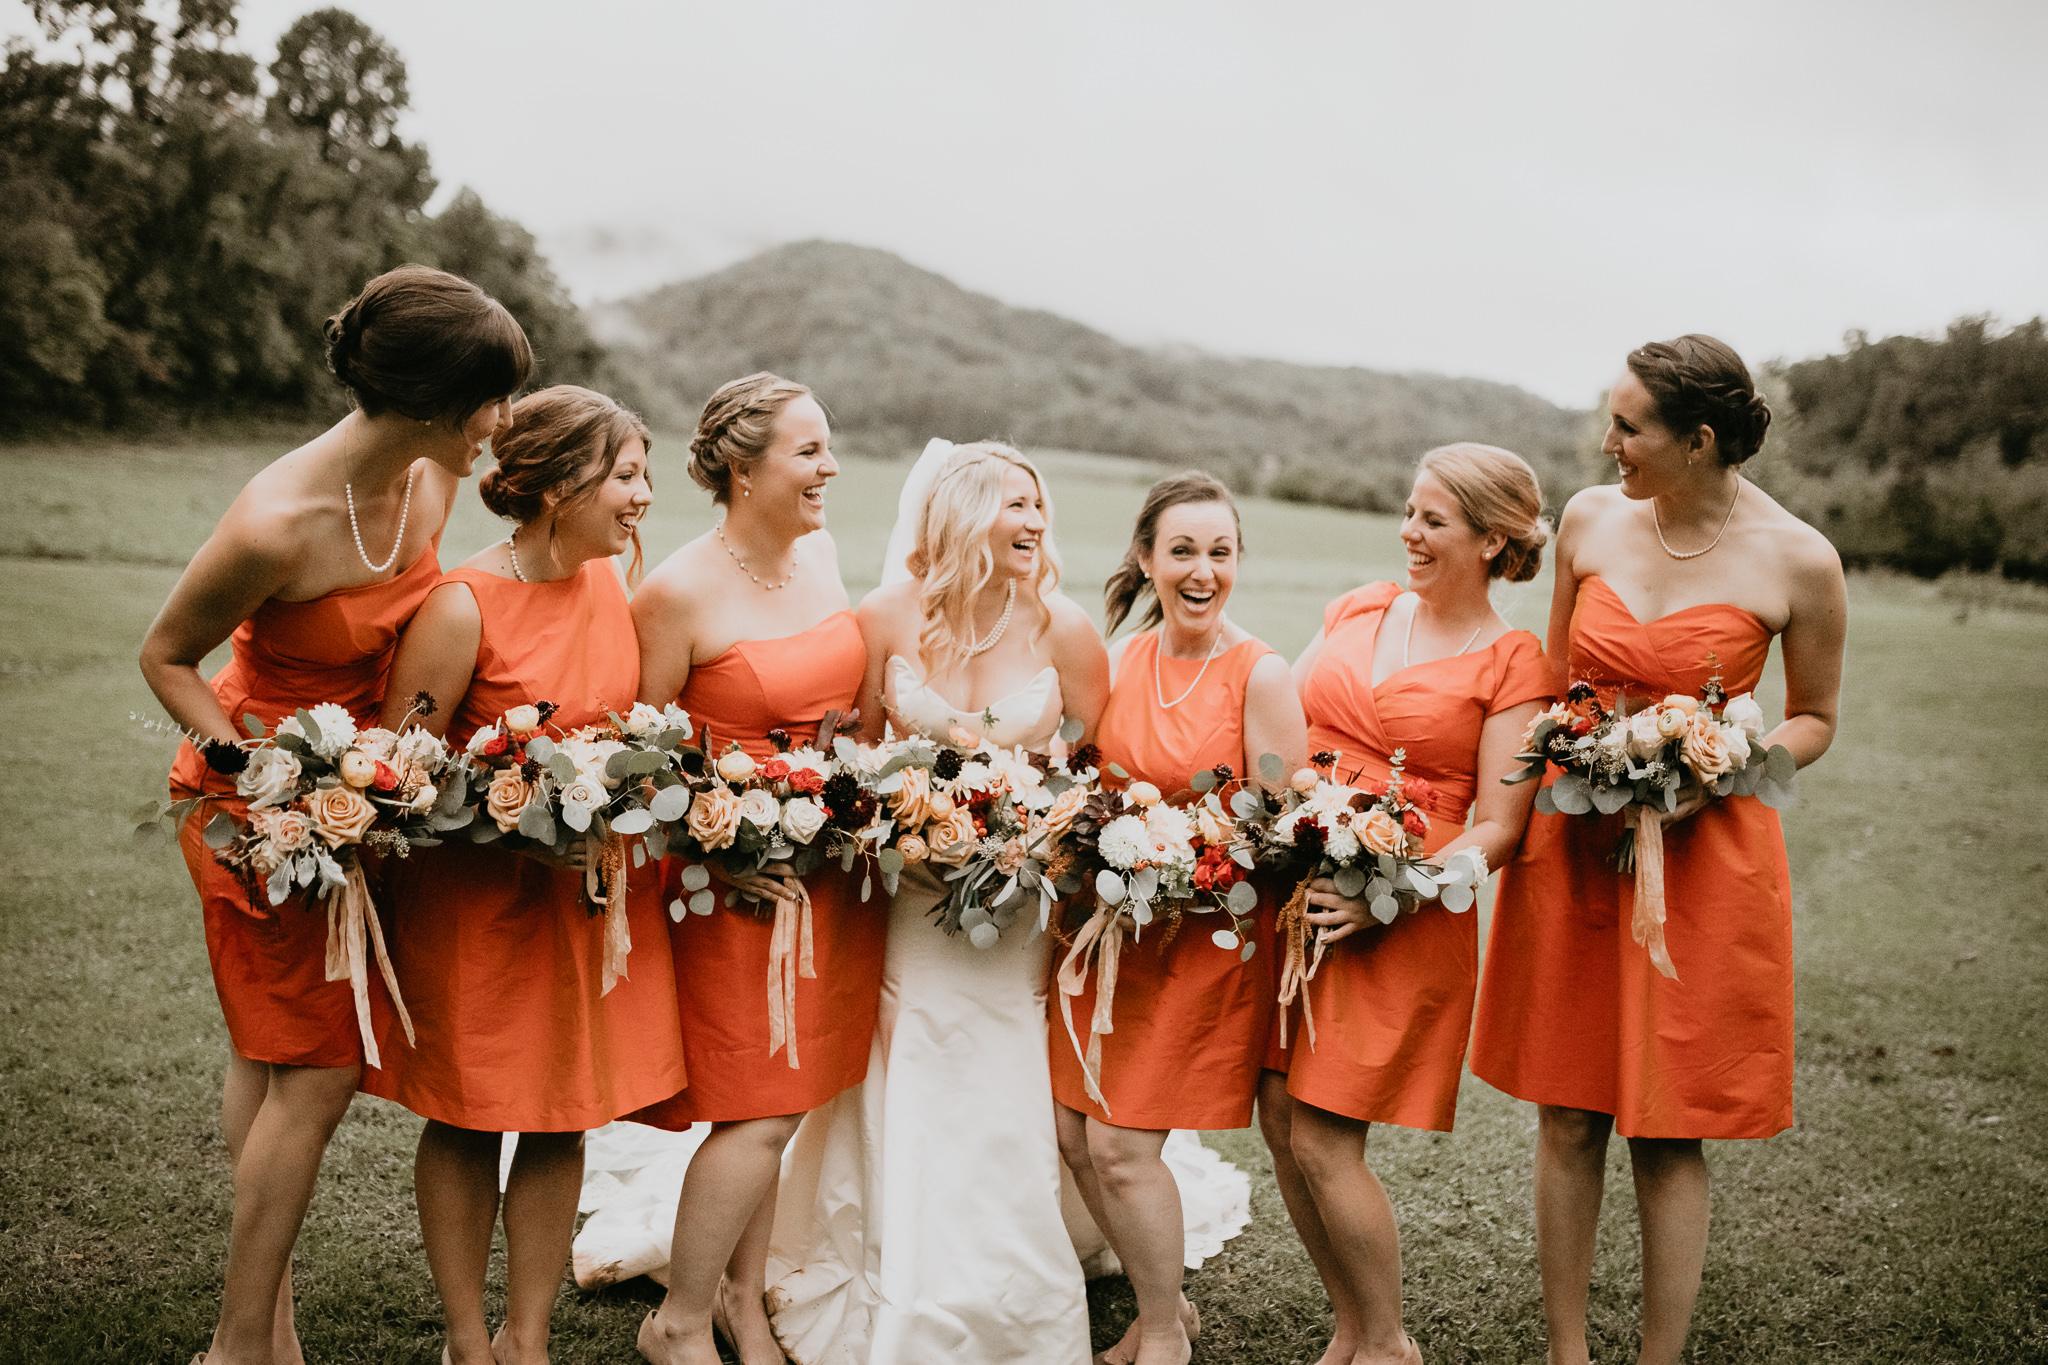 Sundara - Weddings - Virginia - Best Wedding Photographer - Pat Cori Photography-64.jpg